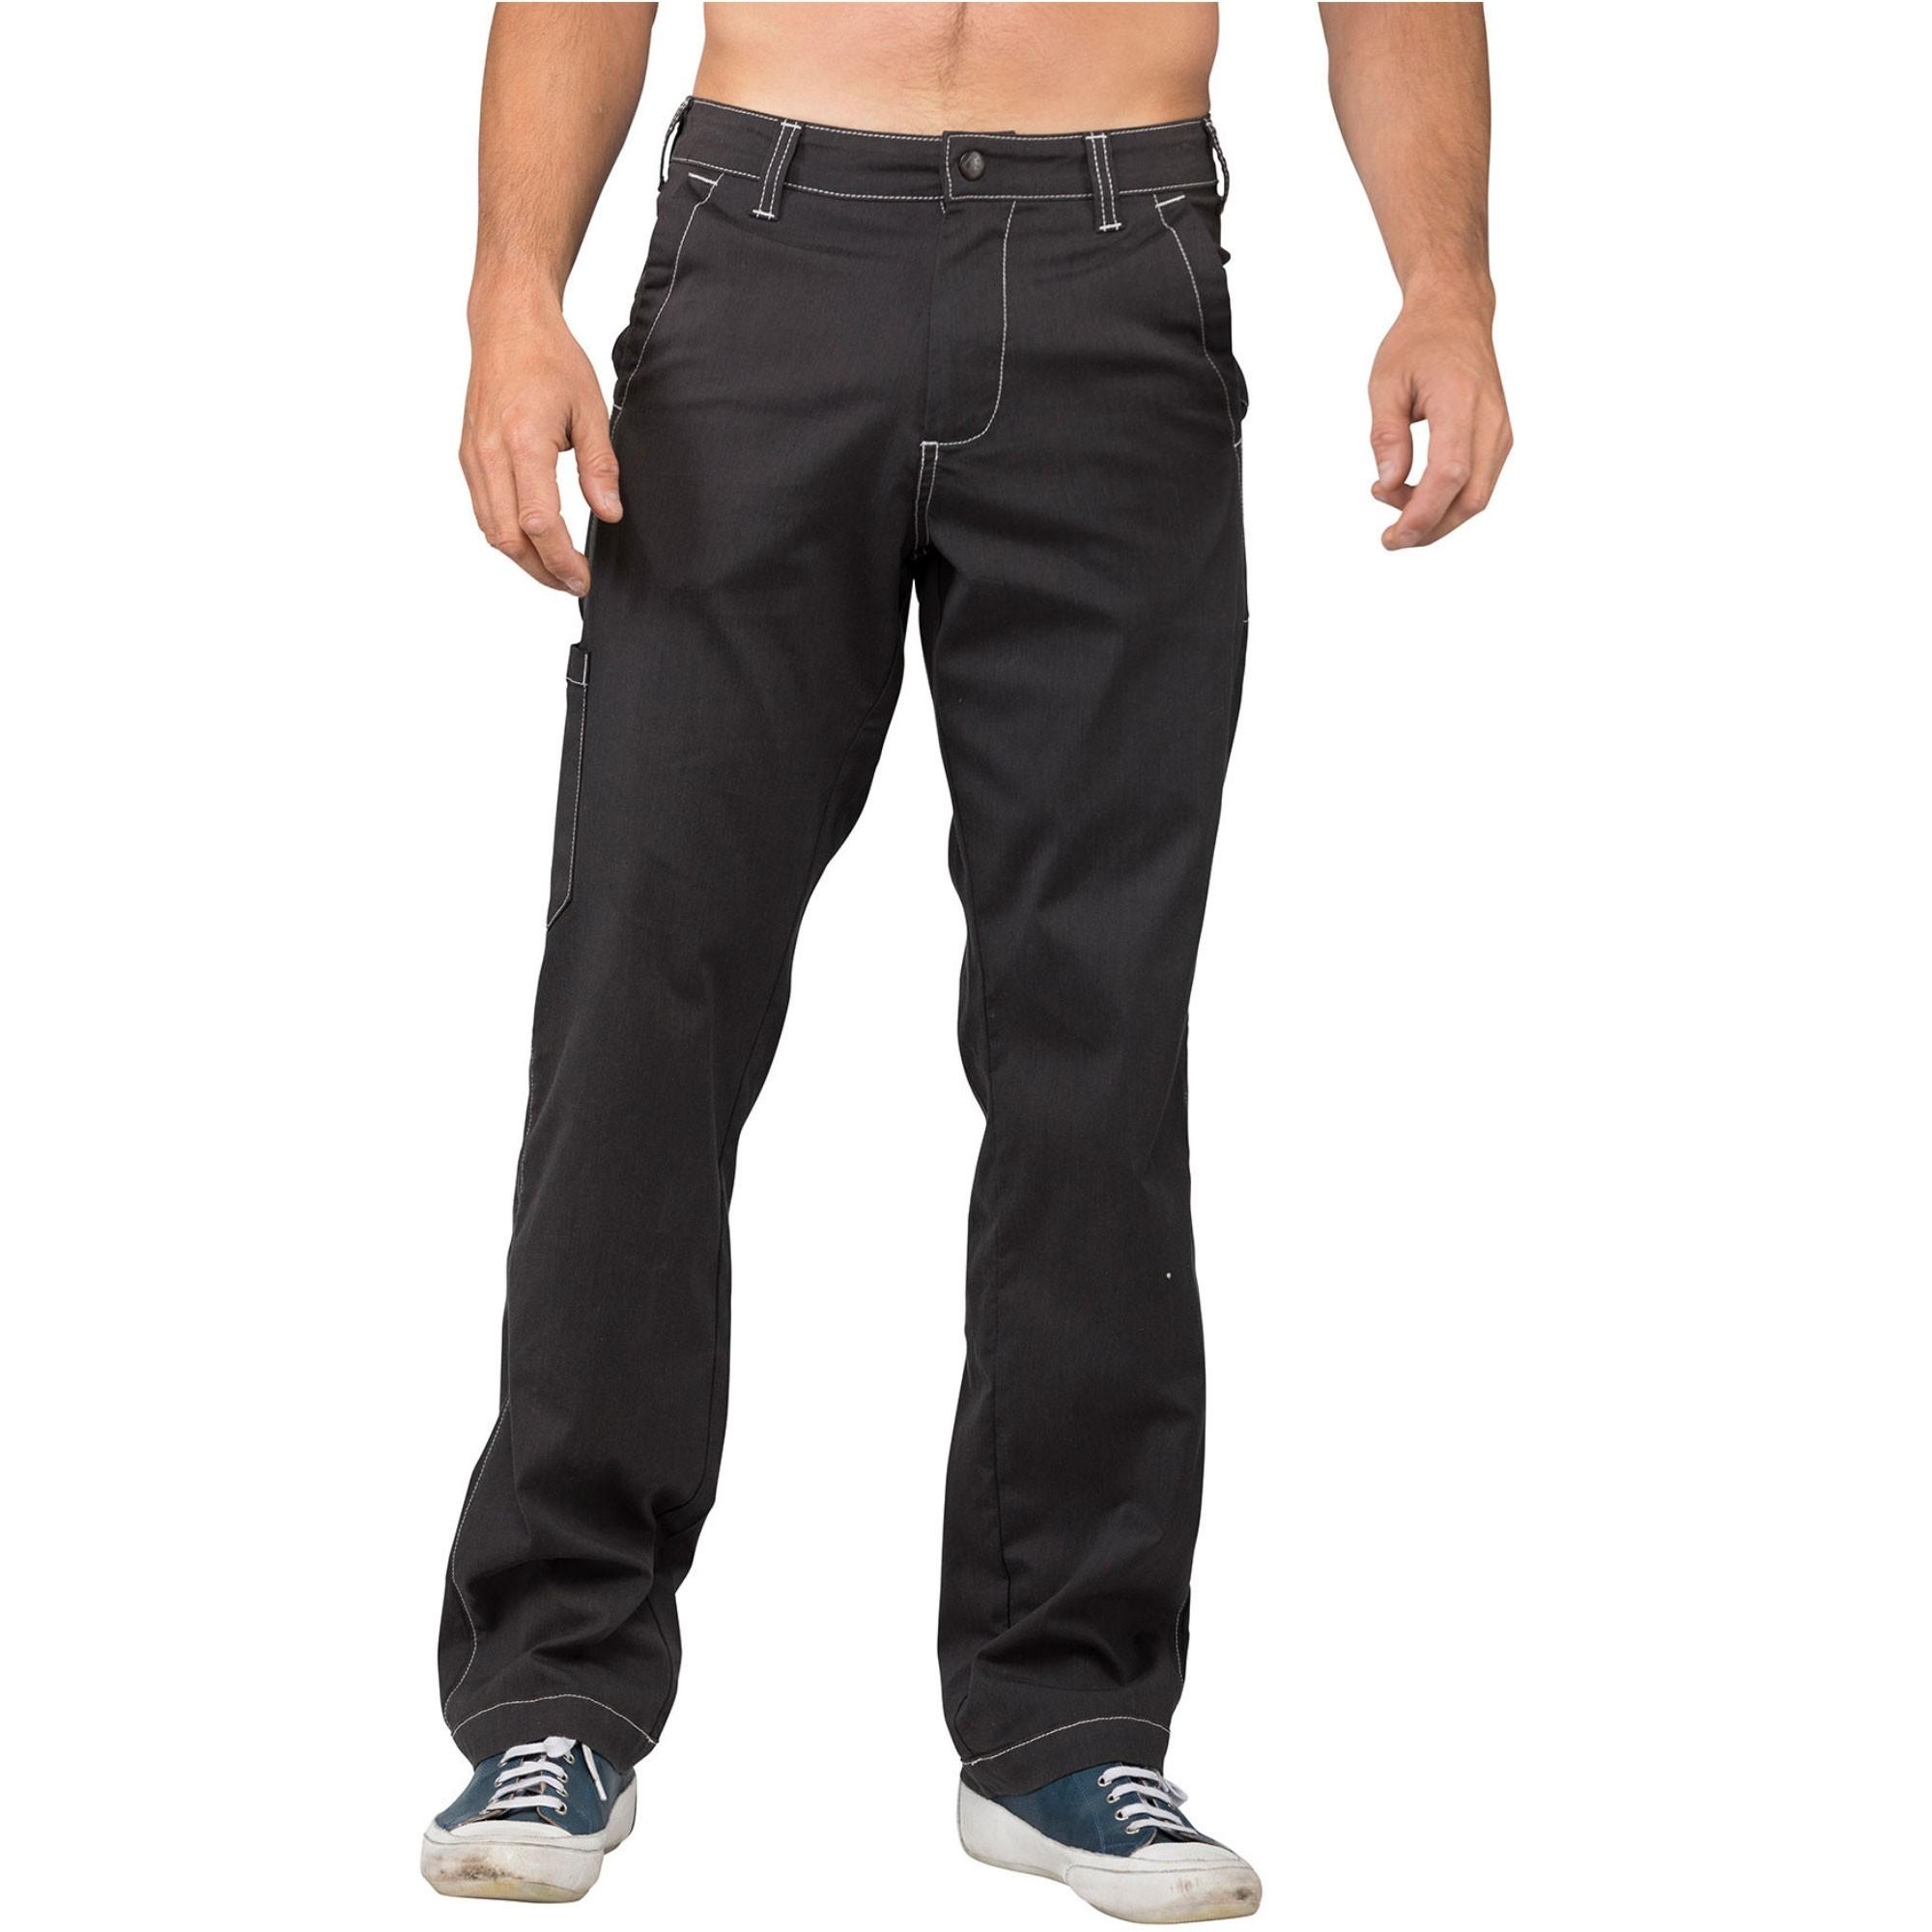 Chillaz Dani Climbing Pants - Titan - front